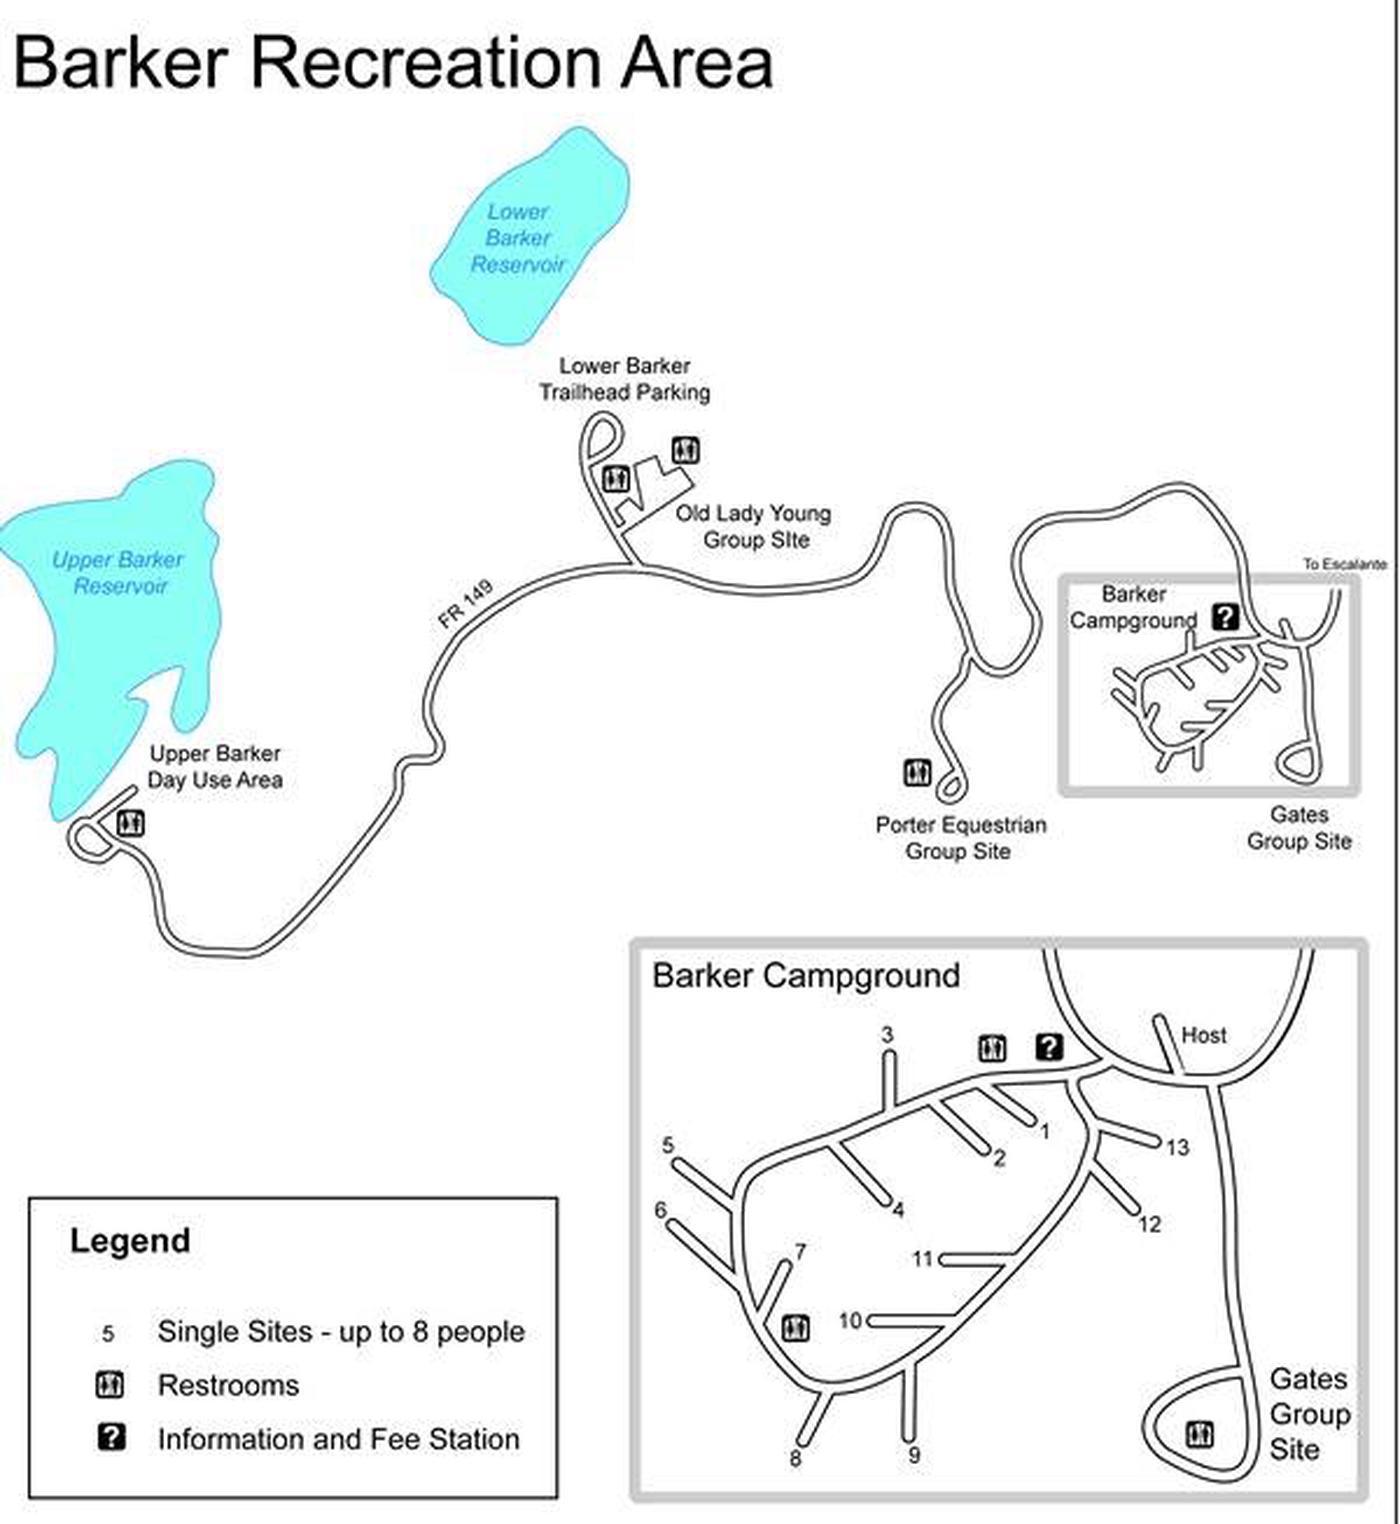 Barker Recreation Area Map